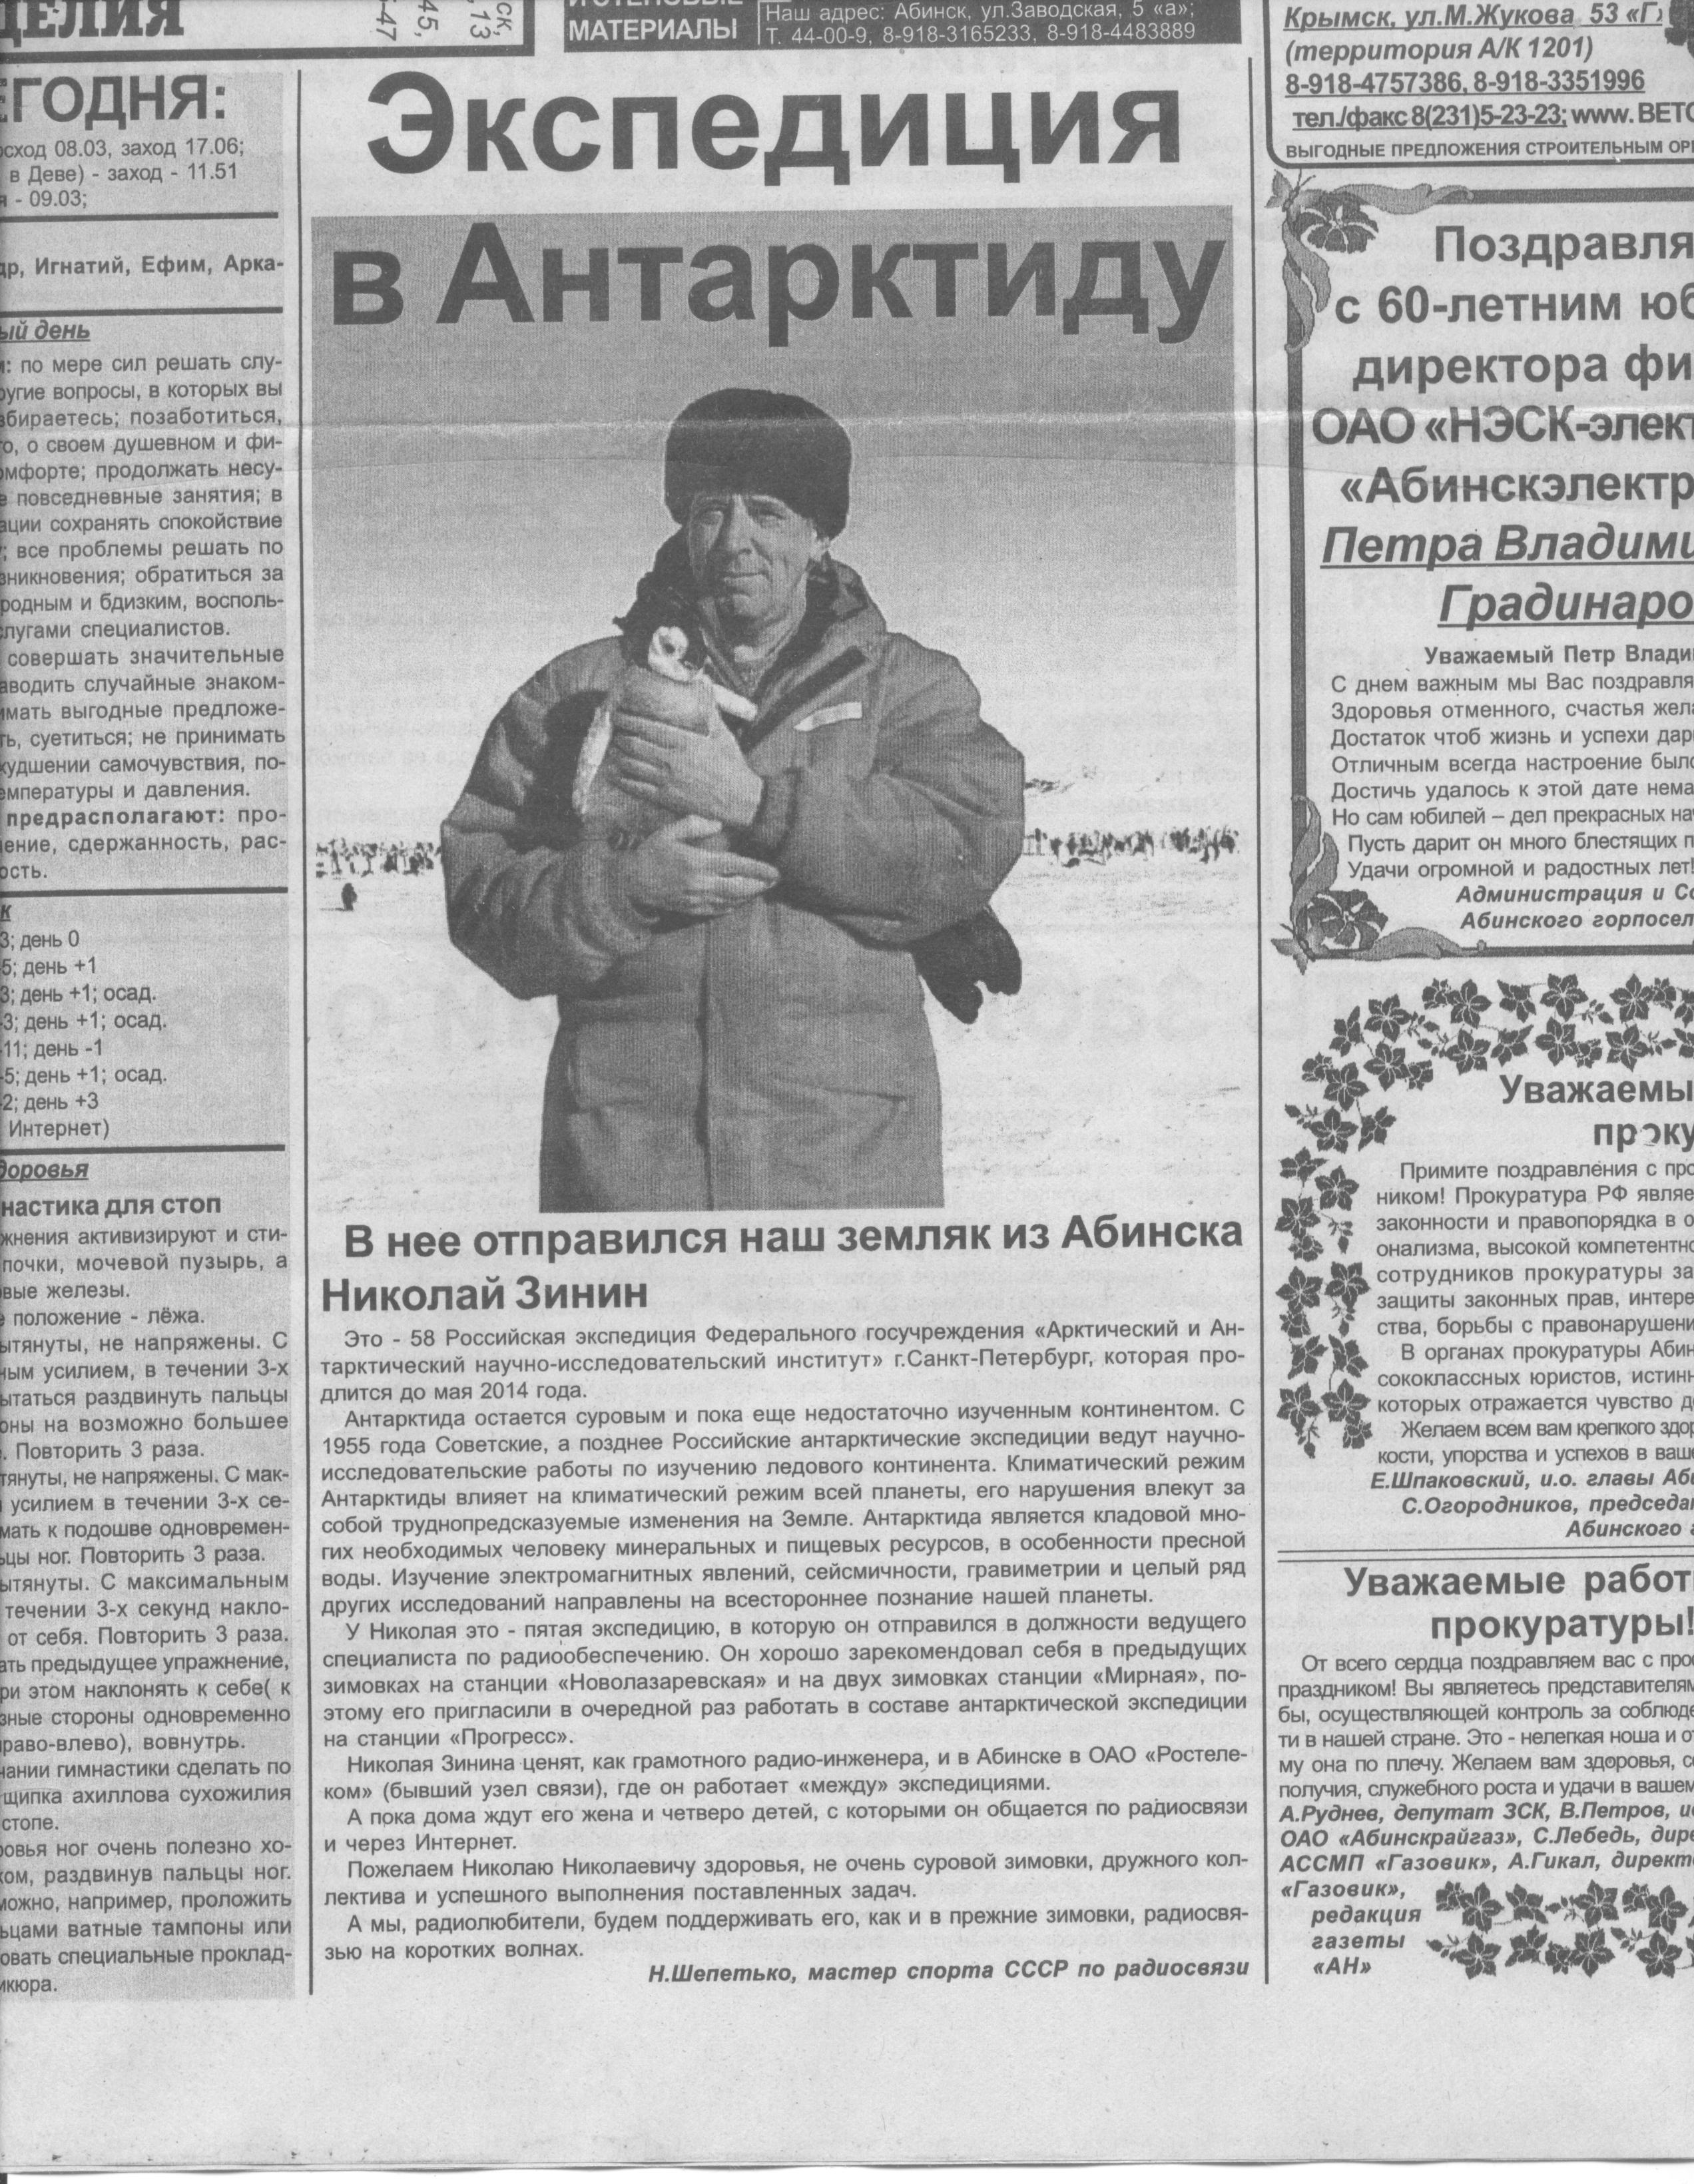 http://rk6ayn.ucoz.ru/info/antarktida.jpg